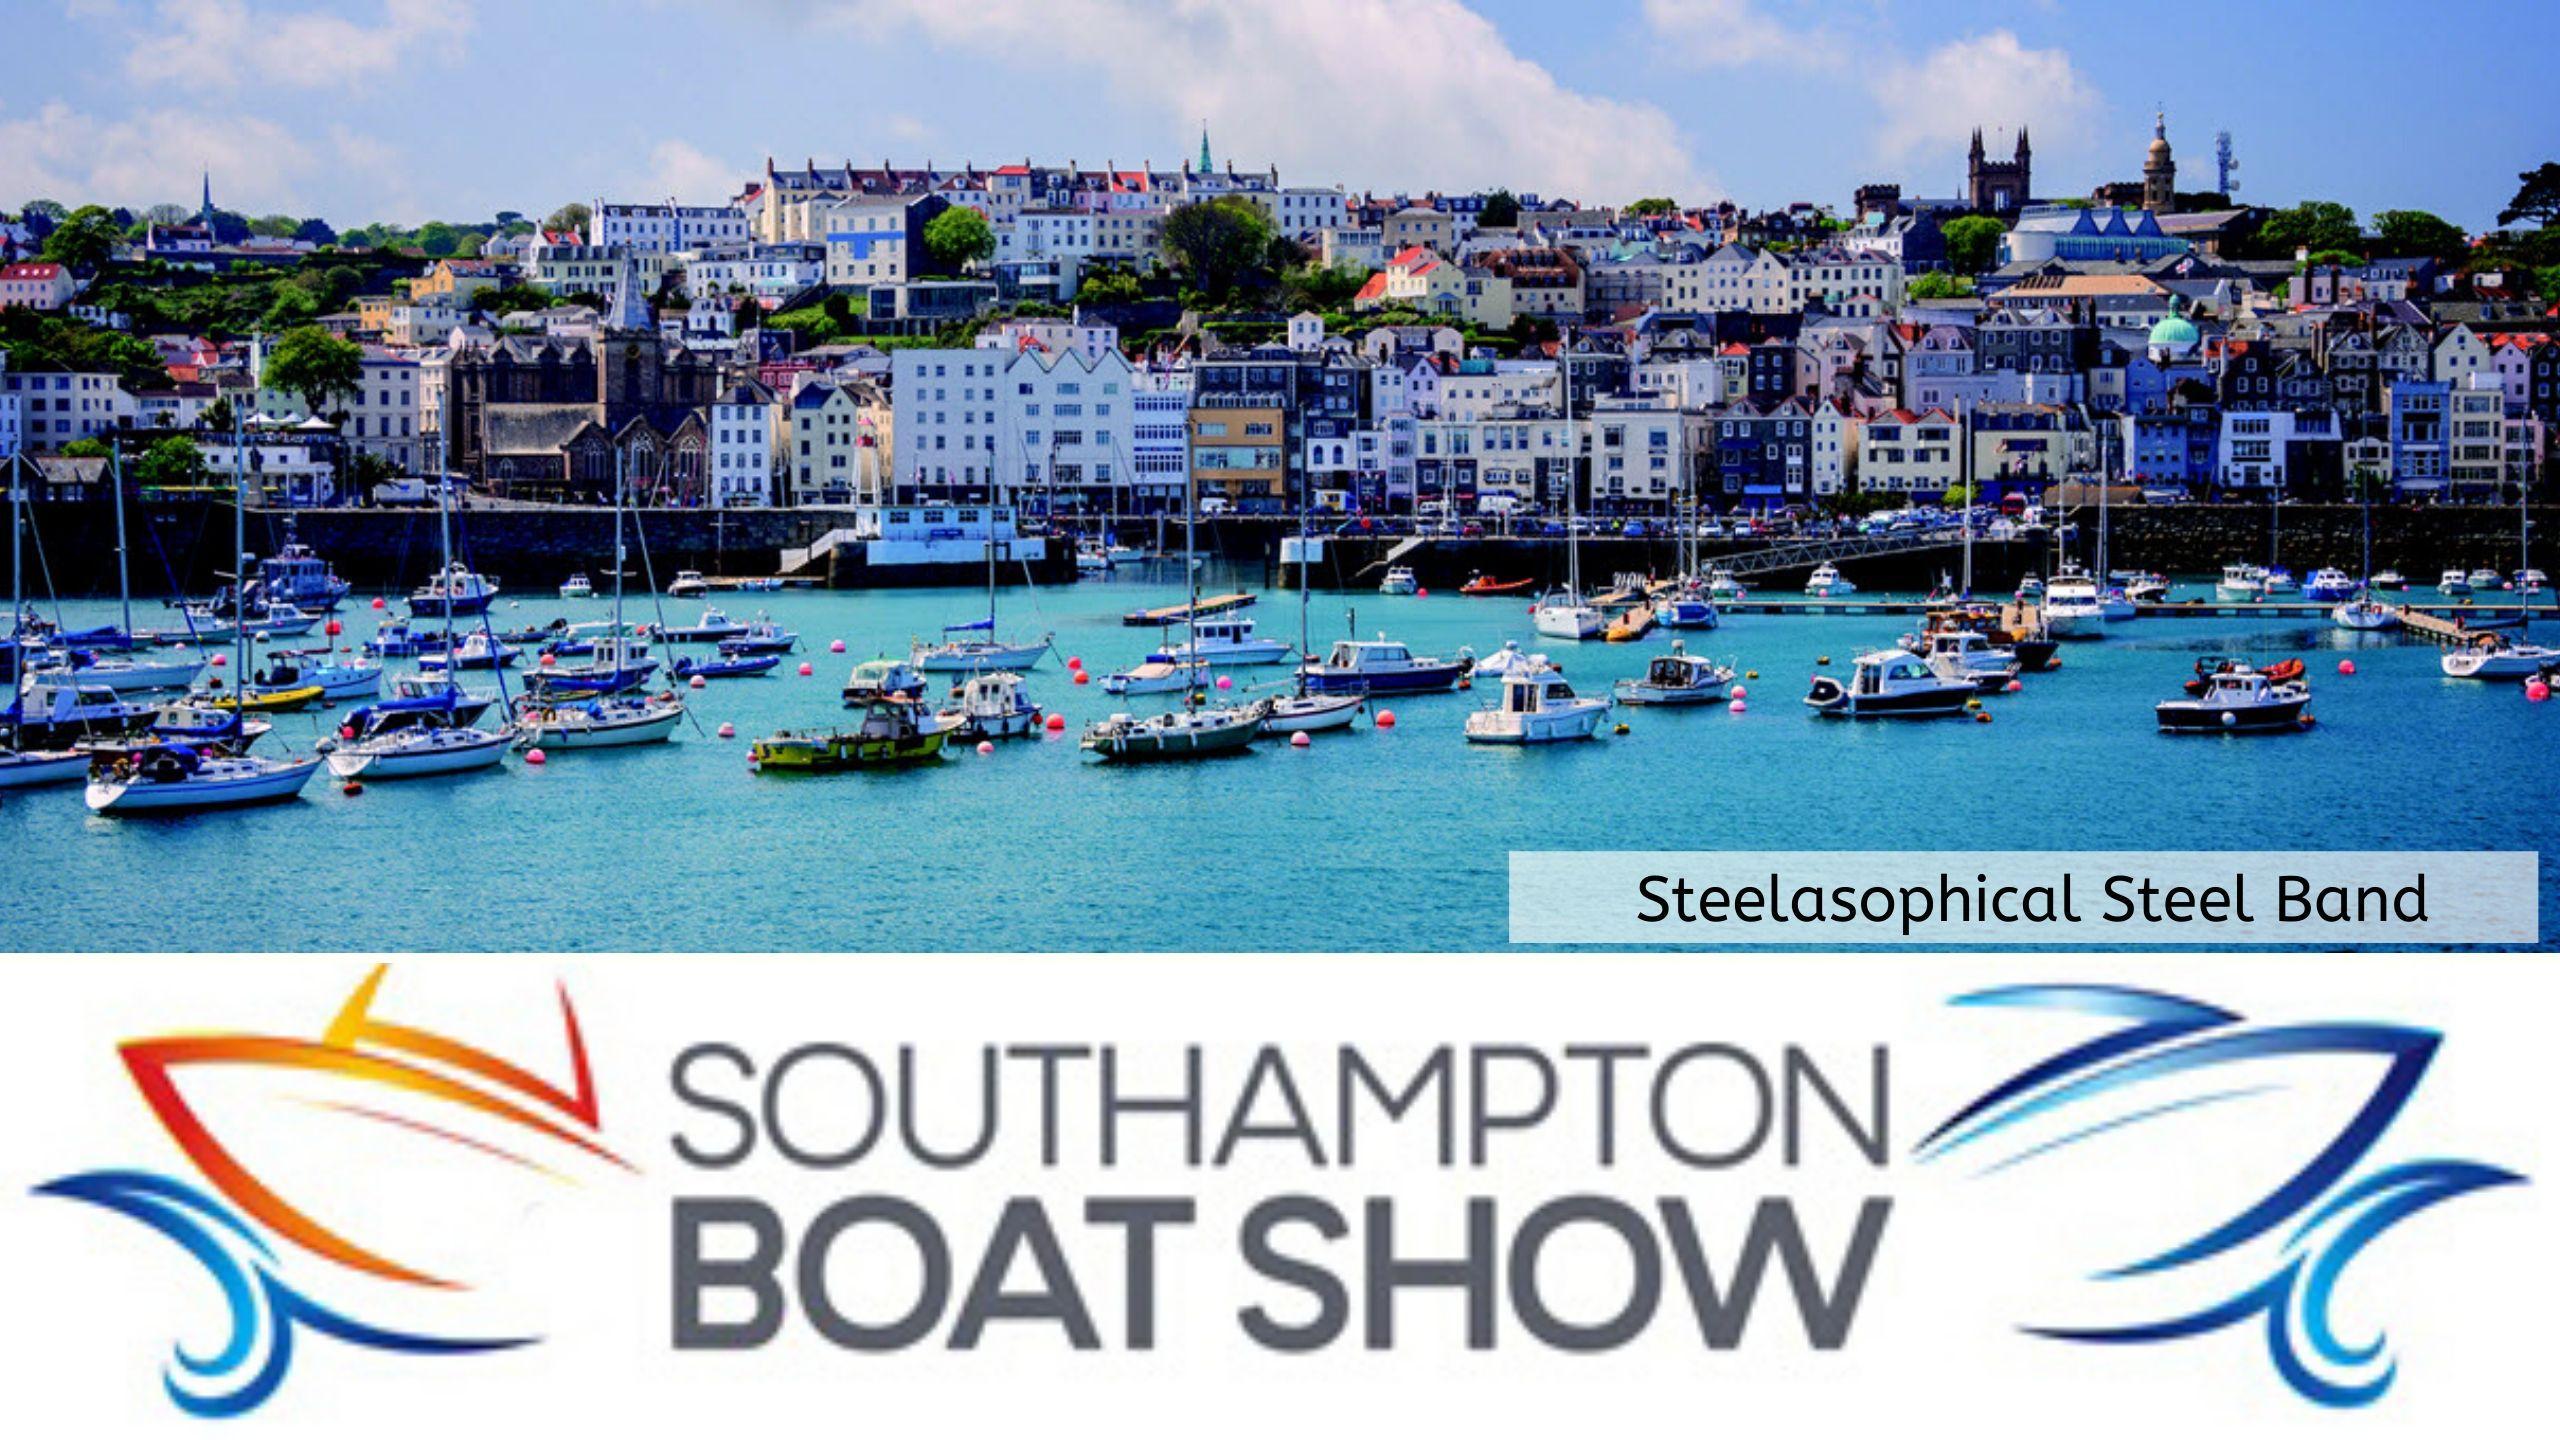 Steelasophical Steel Band Soton Southampton Boat Show YachtMarket Yacht Market